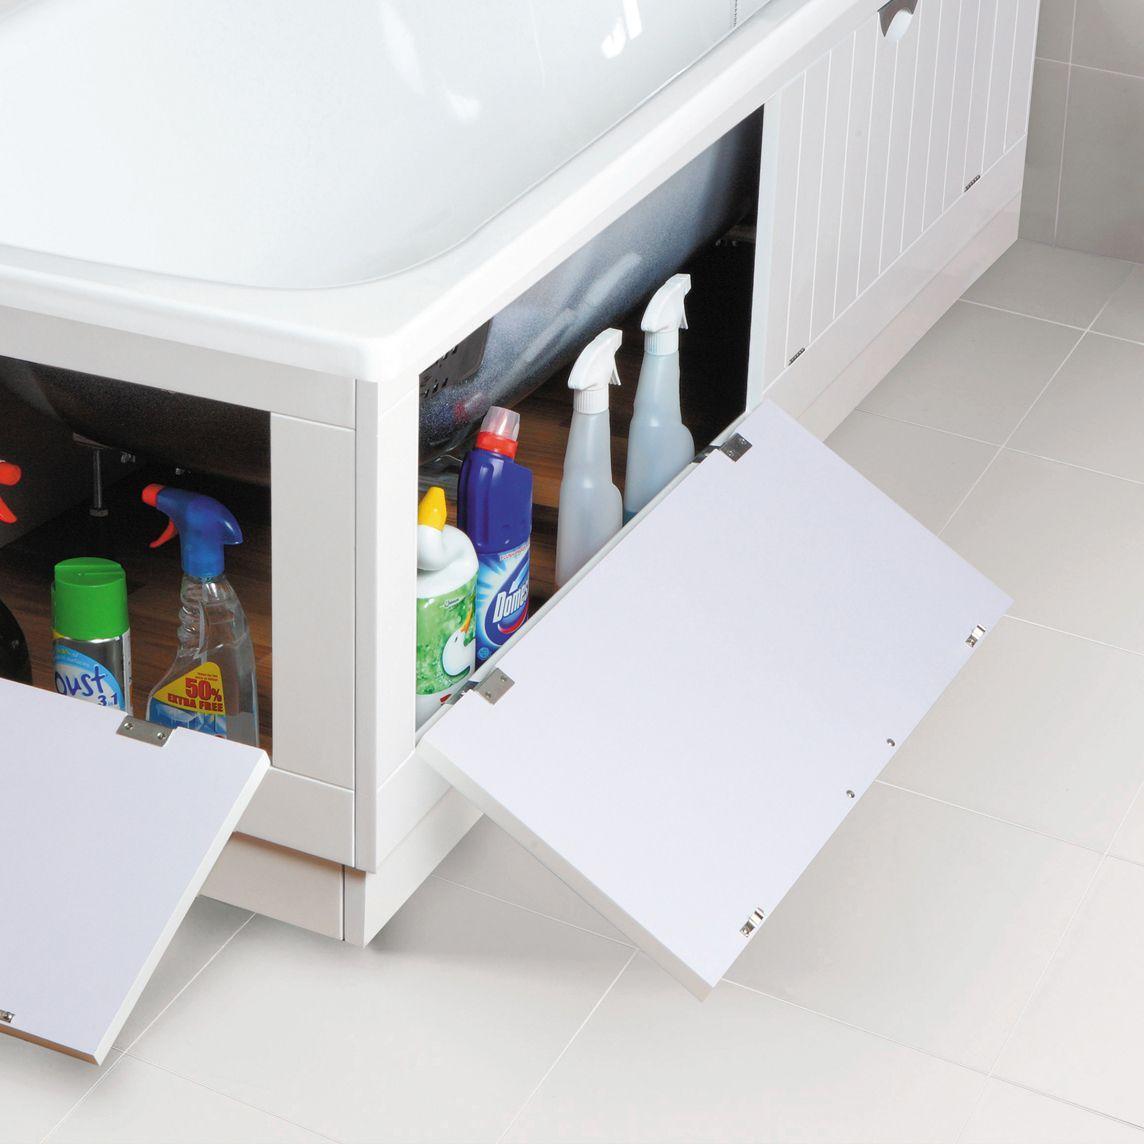 B q bathroom scales - Cooke Lewis Universal White Bath Storage Front Panel W 1700mm